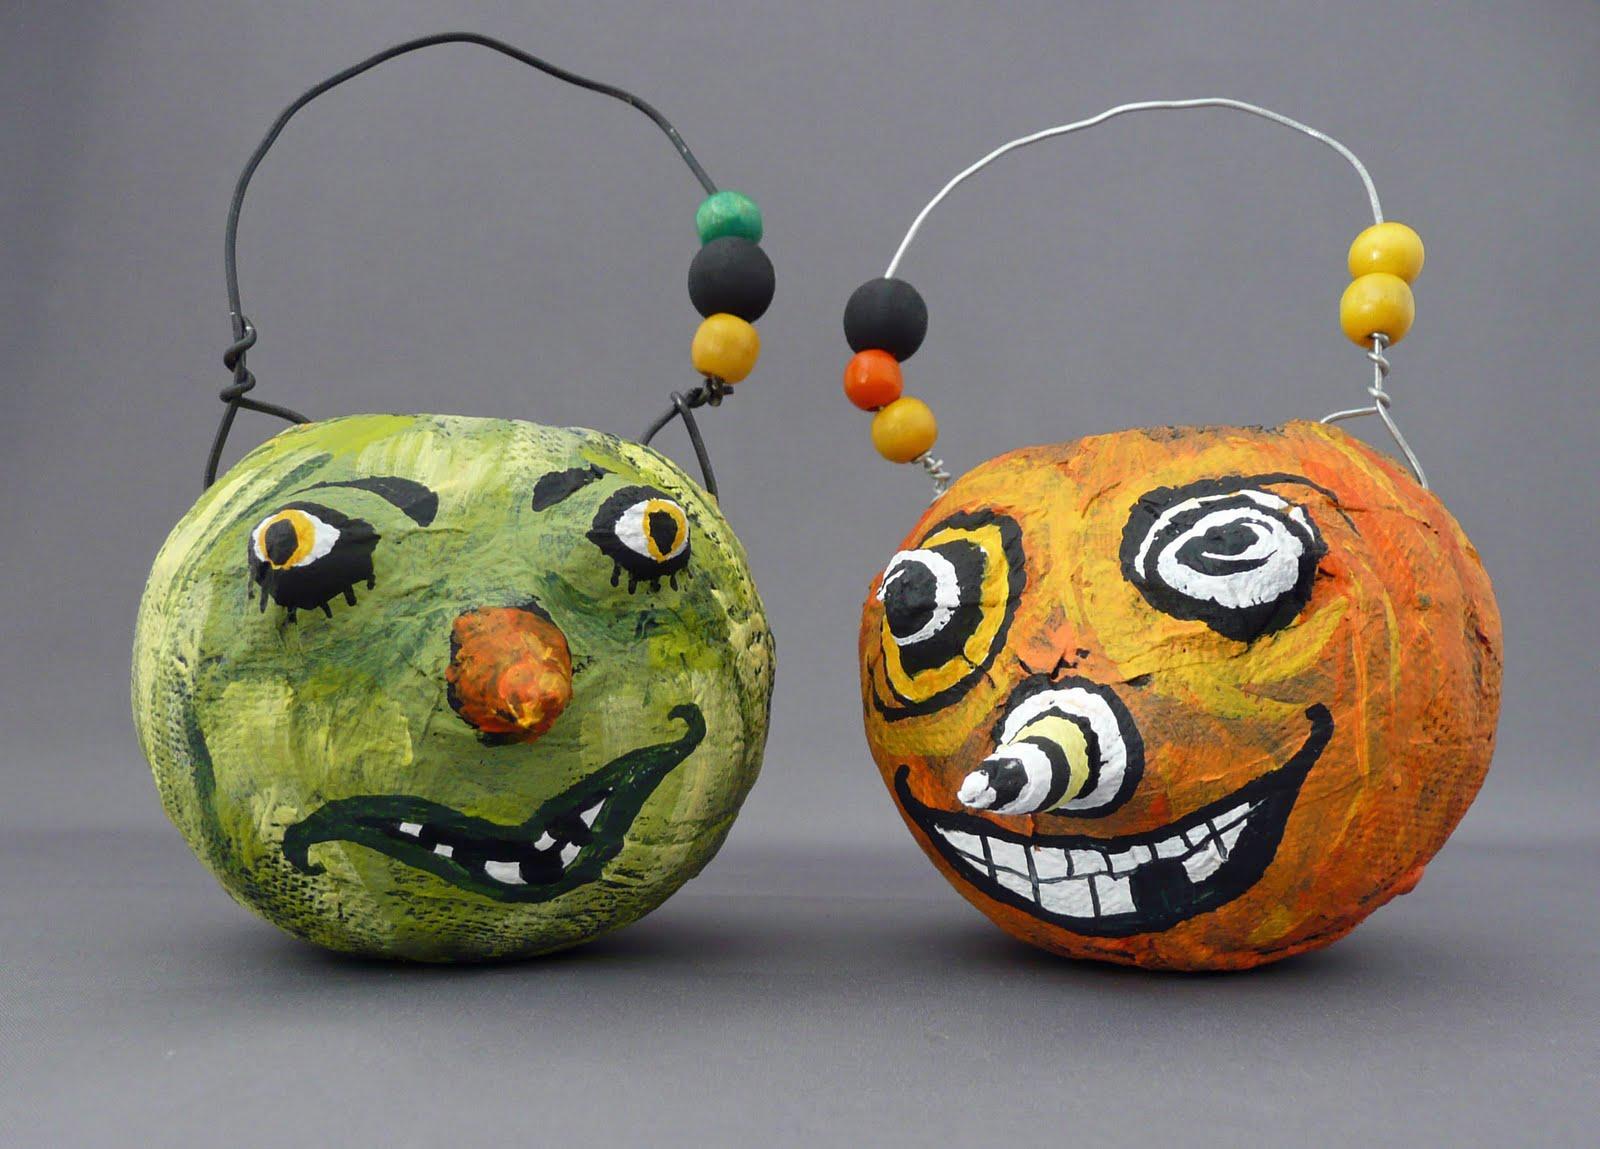 Papier Mache intérieur that artist woman: little papier mache pumpkins